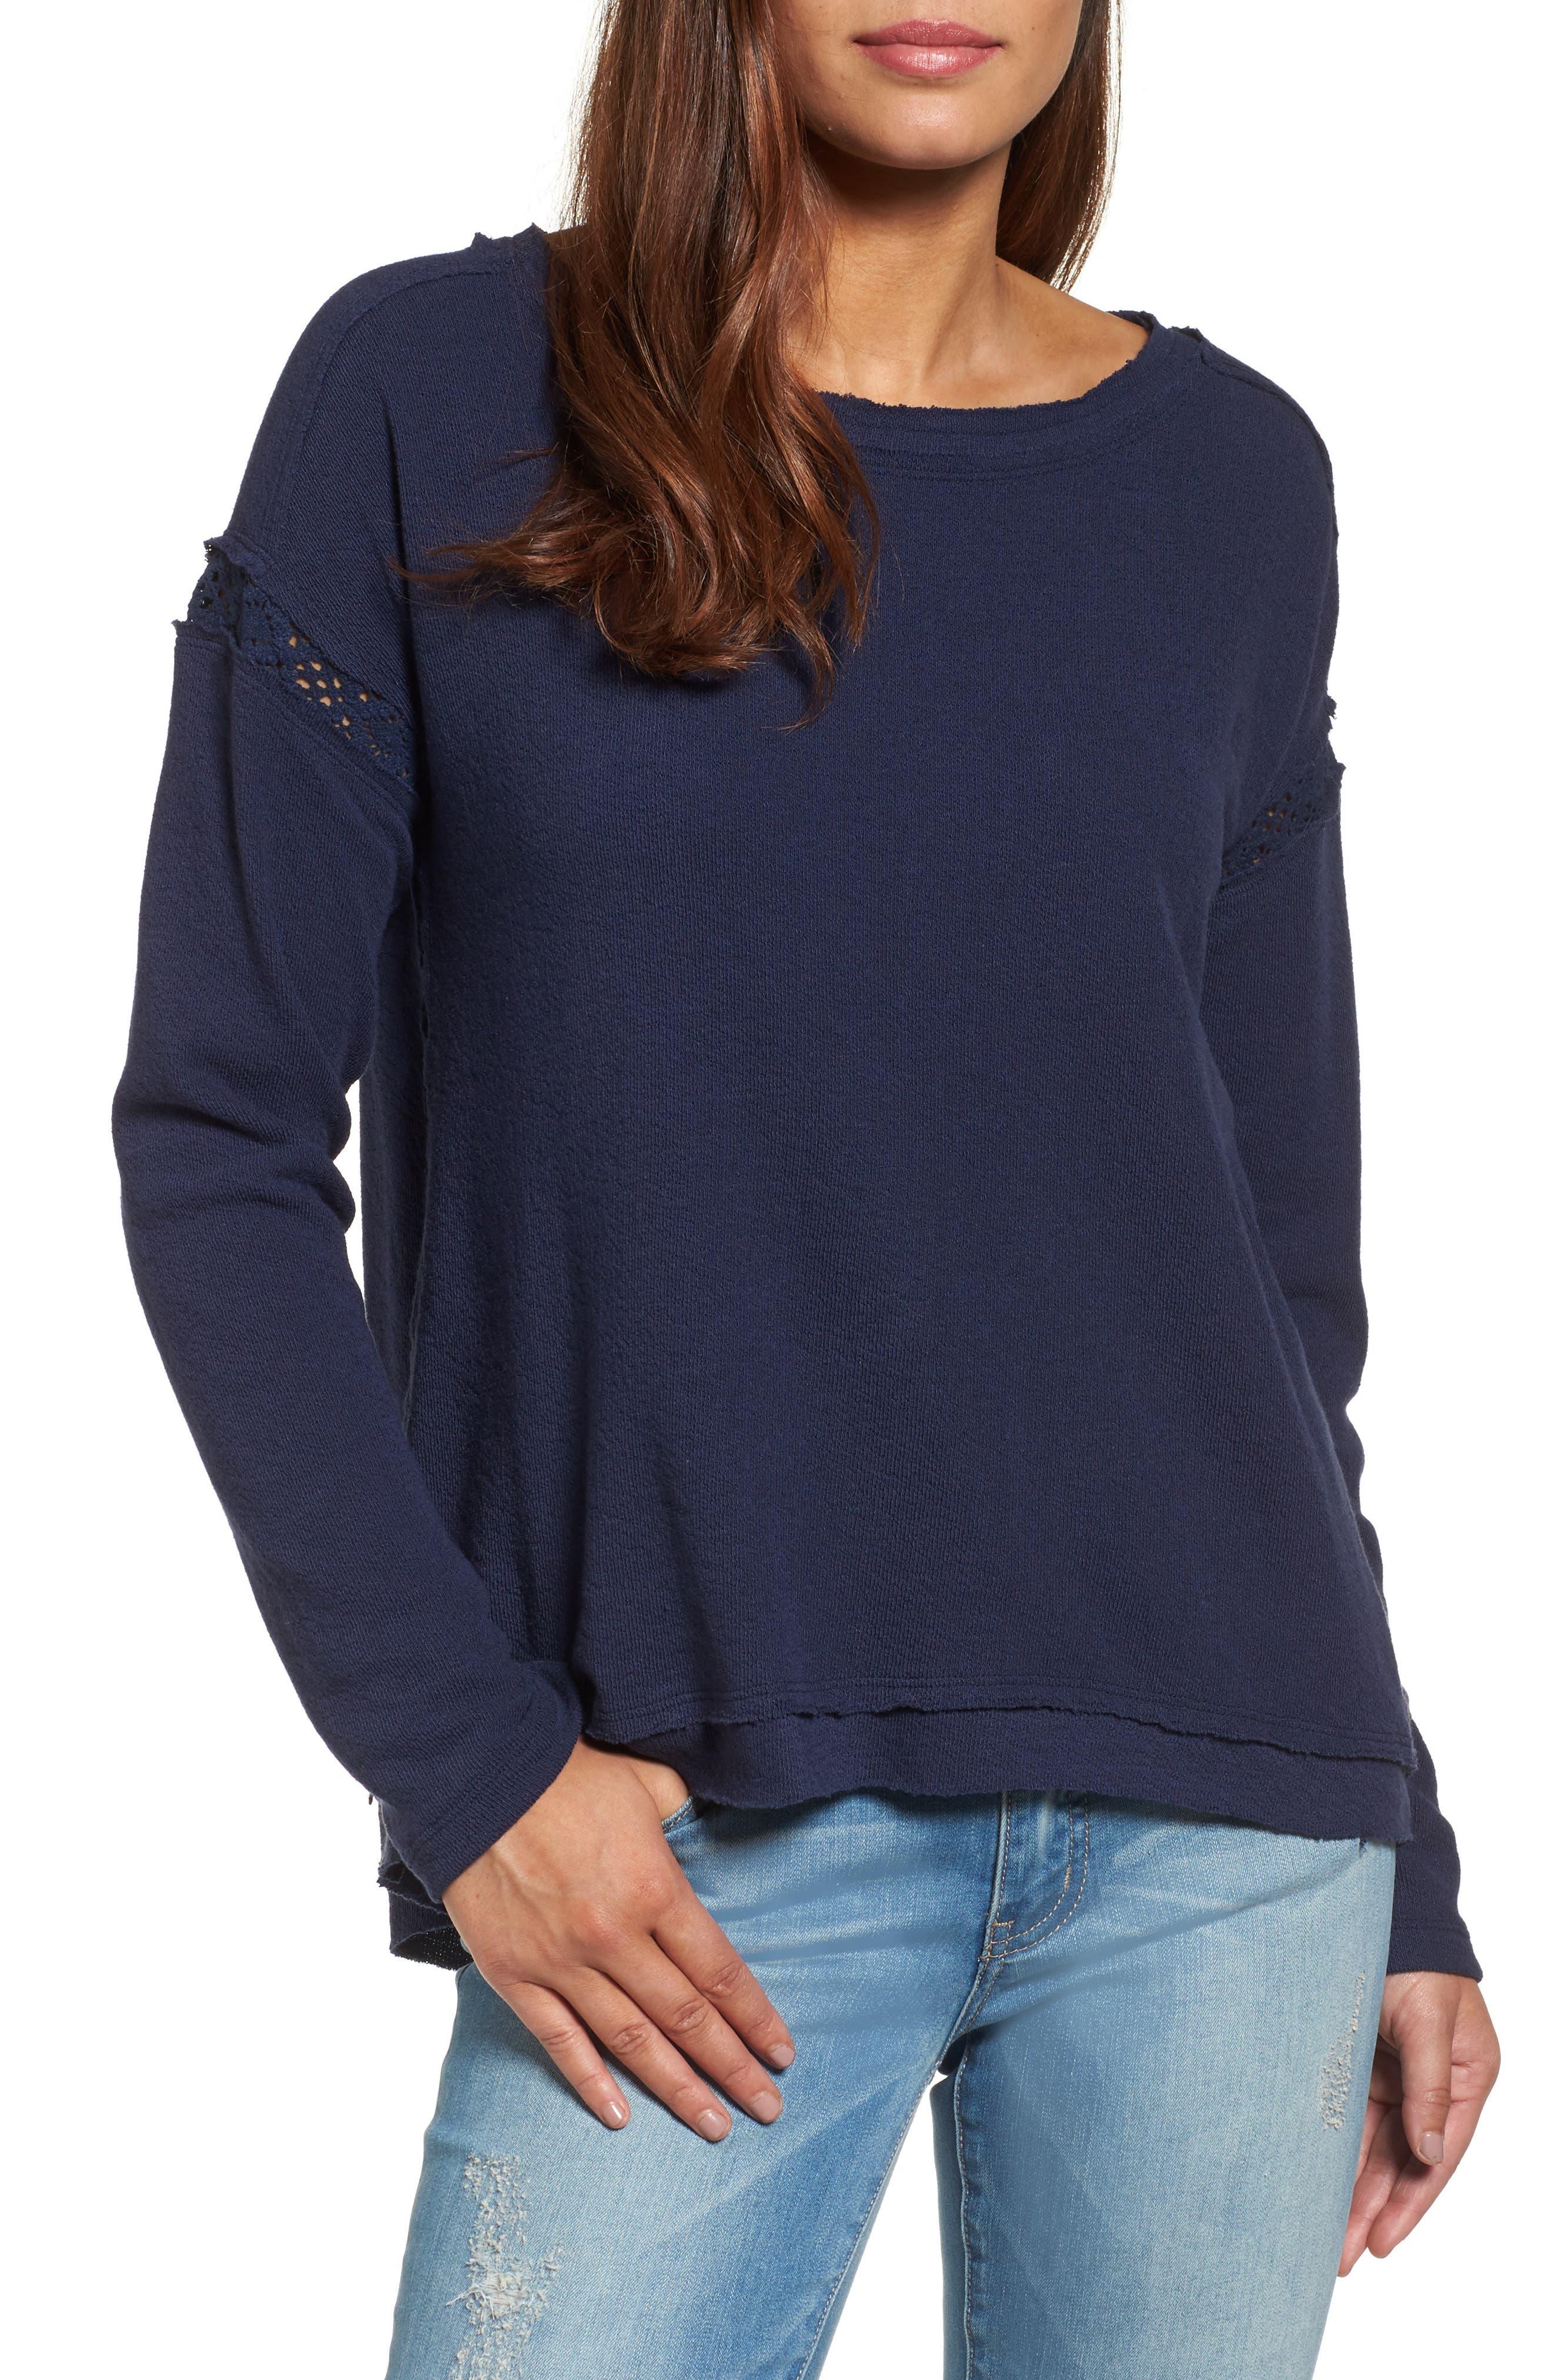 Crochet Lace Trim Sweatshirt,                         Main,                         color, Navy Peacoat